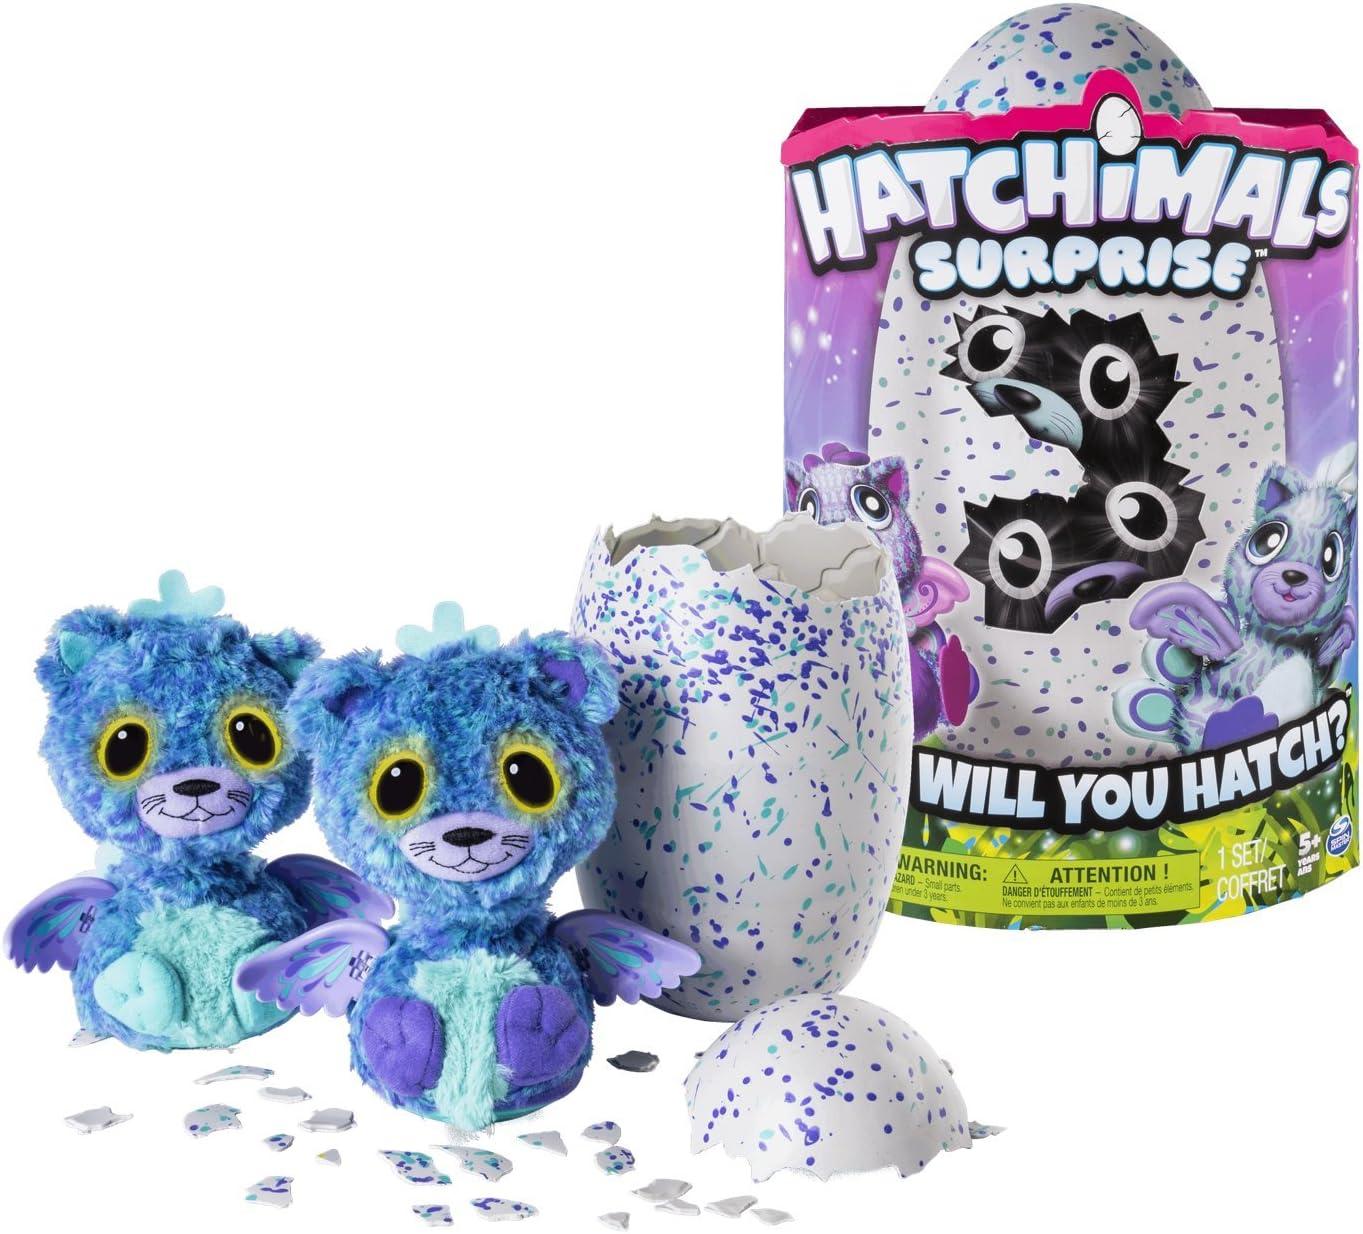 HATCHIMALS Spin Master Surprise Purple Teal Egg versi/ón importada